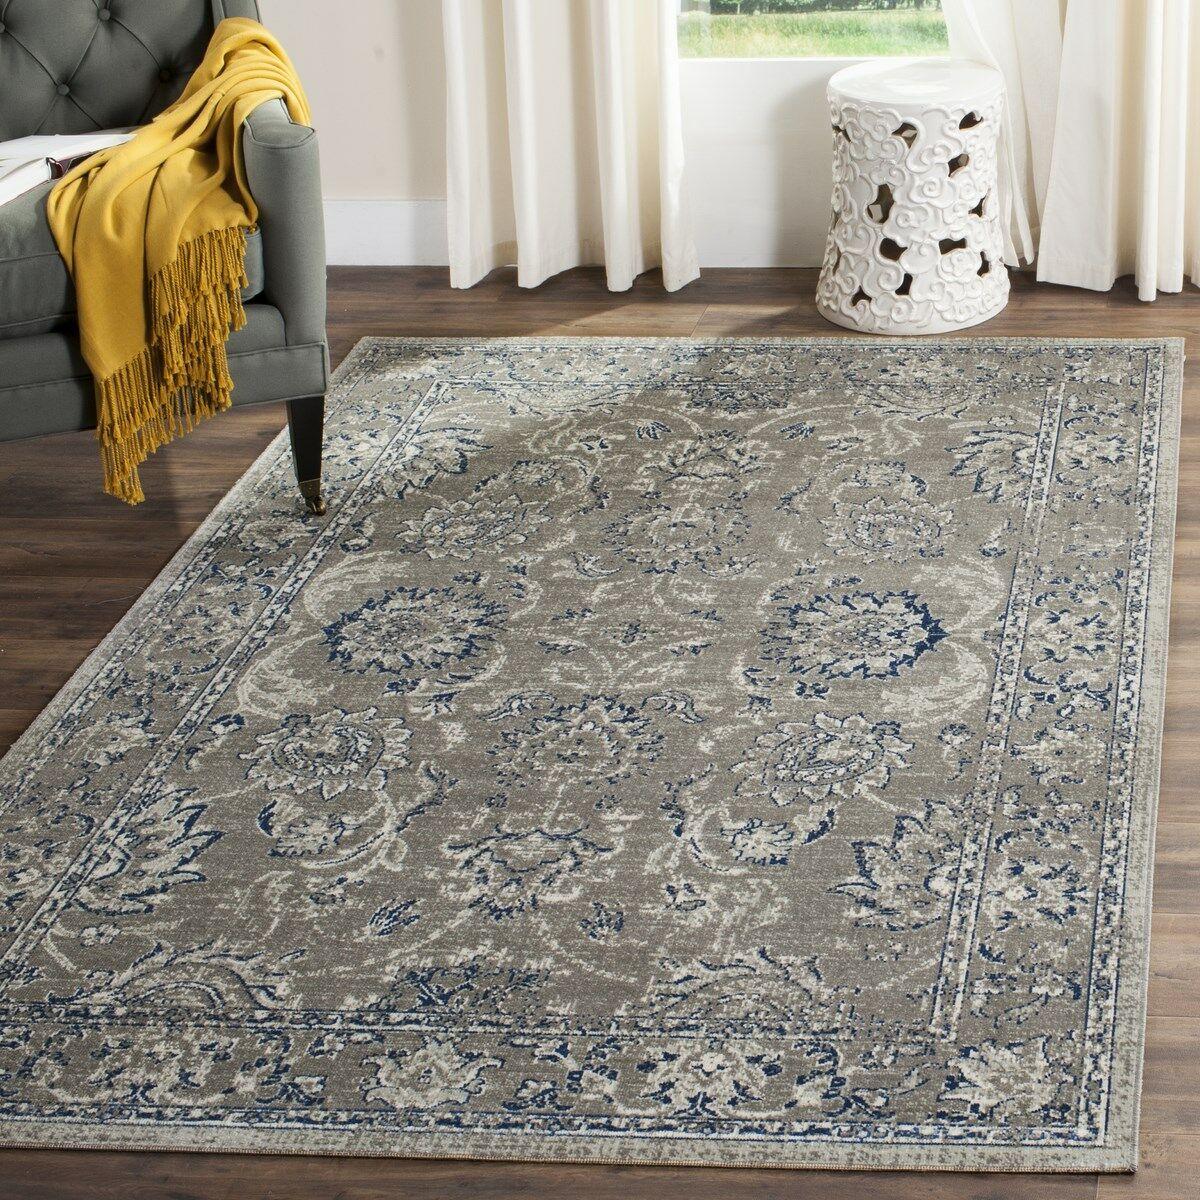 Harwood Cotton Dark Gray/Blue Area Rug Rug Size: Rectangle 10' x 14'